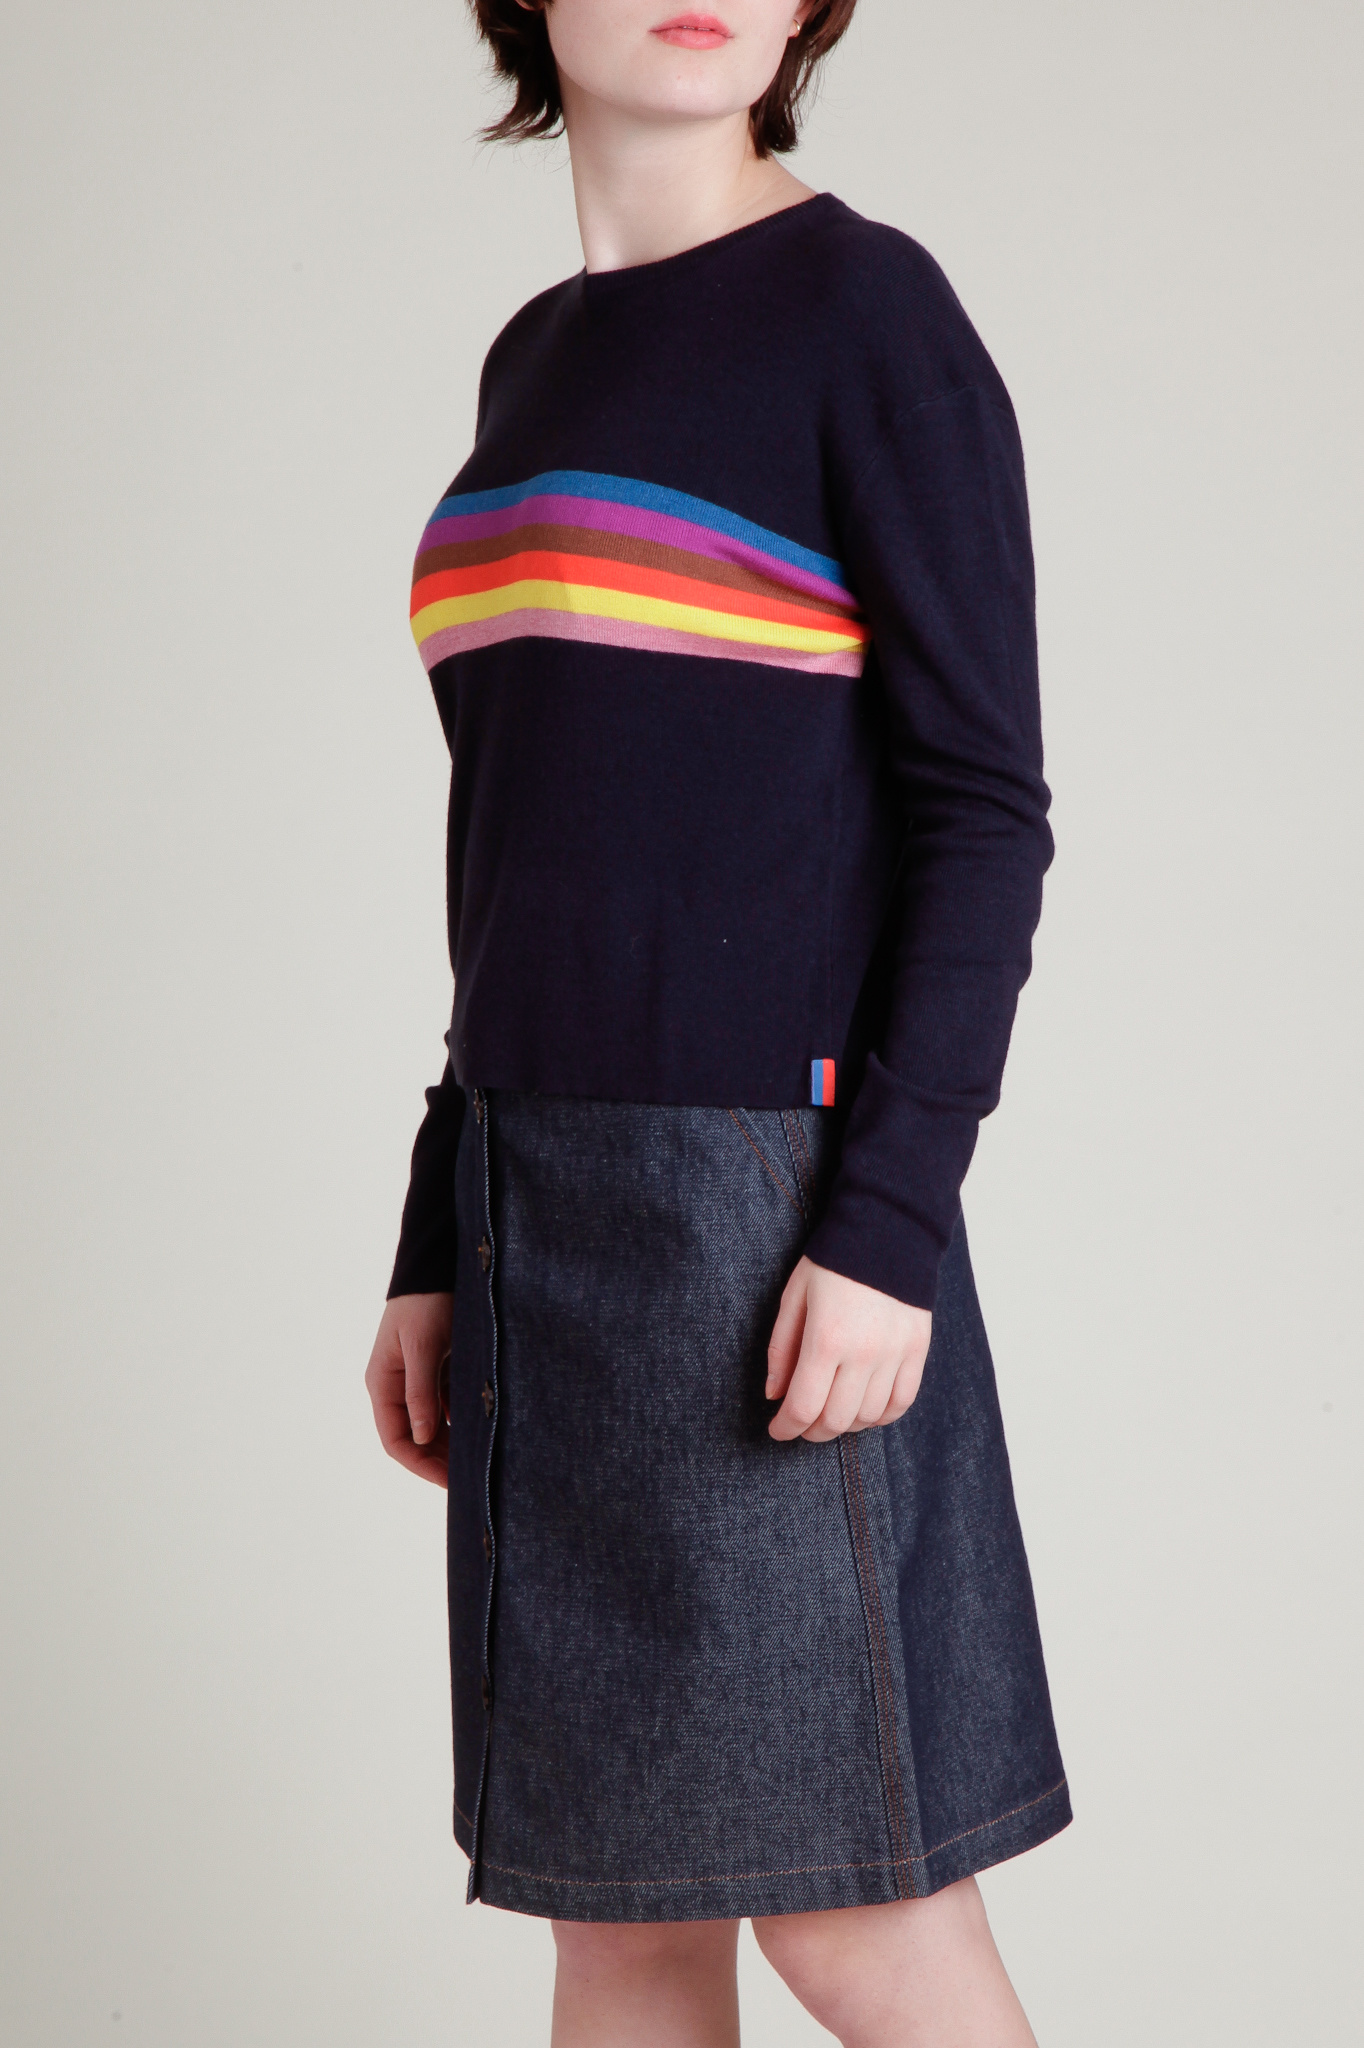 KULE Rainbow Striped Cashmere Blend Sweater